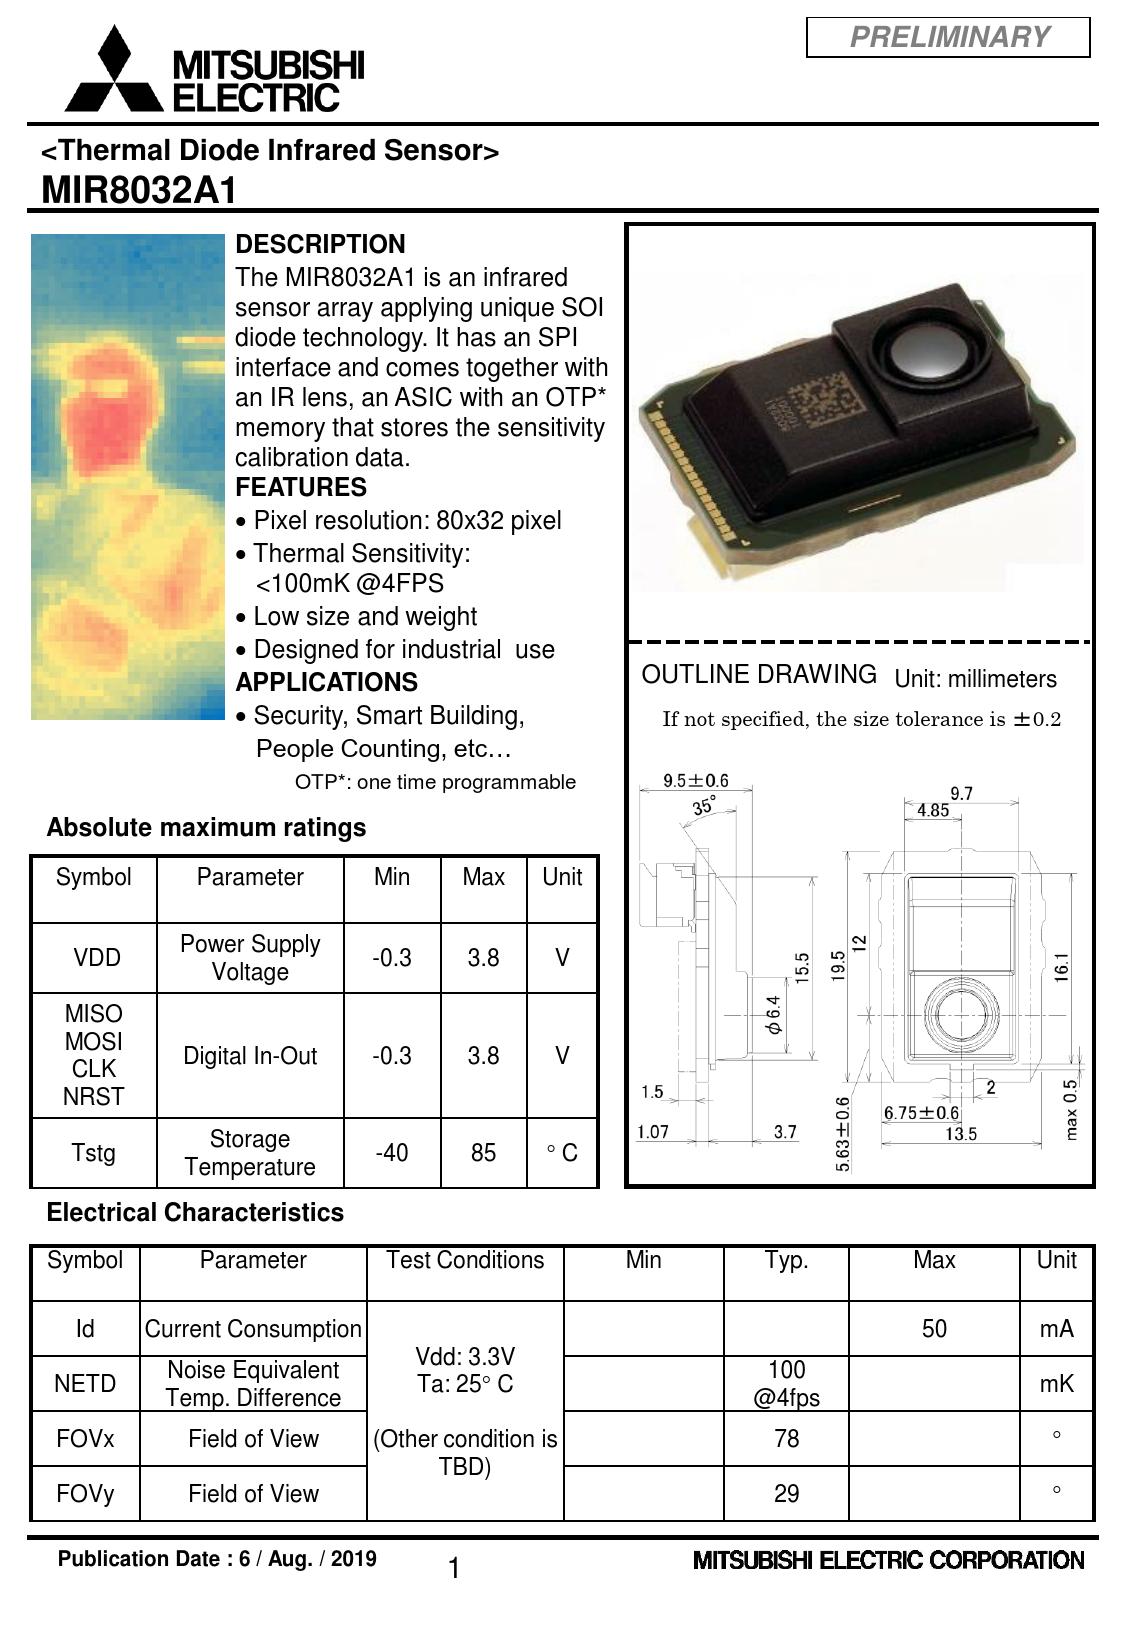 Preliminary Datasheet MIR8032A1 Mitsubishi Electric